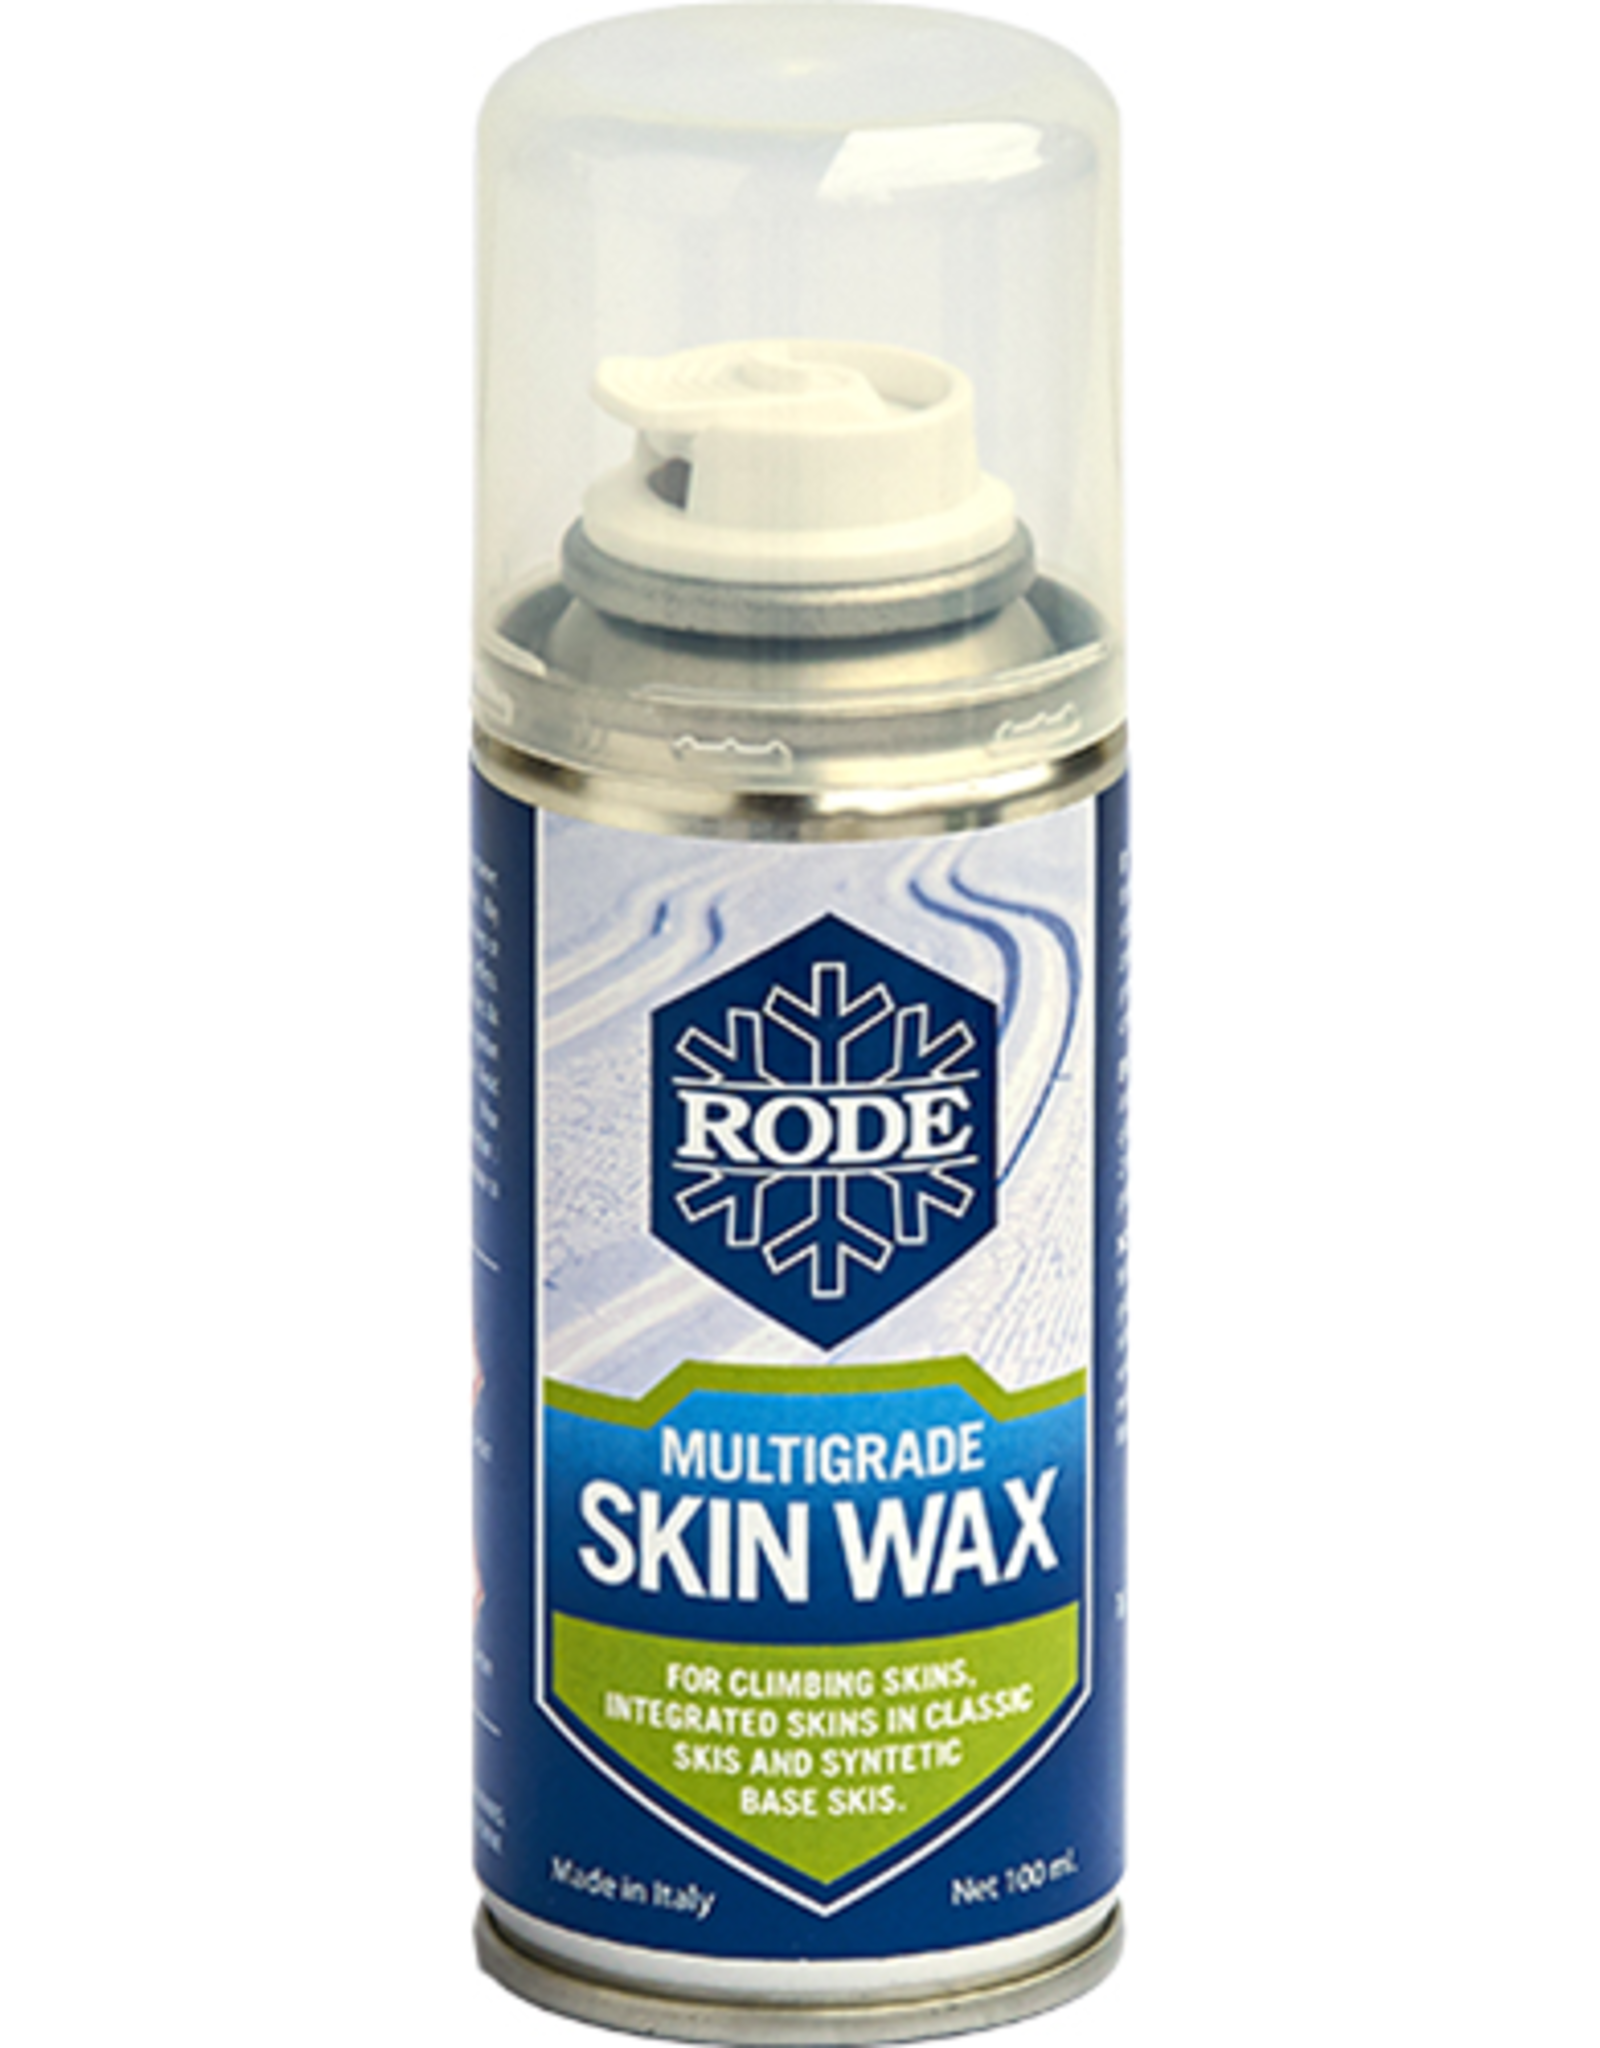 Rode Skin Wax Multigrade Spray